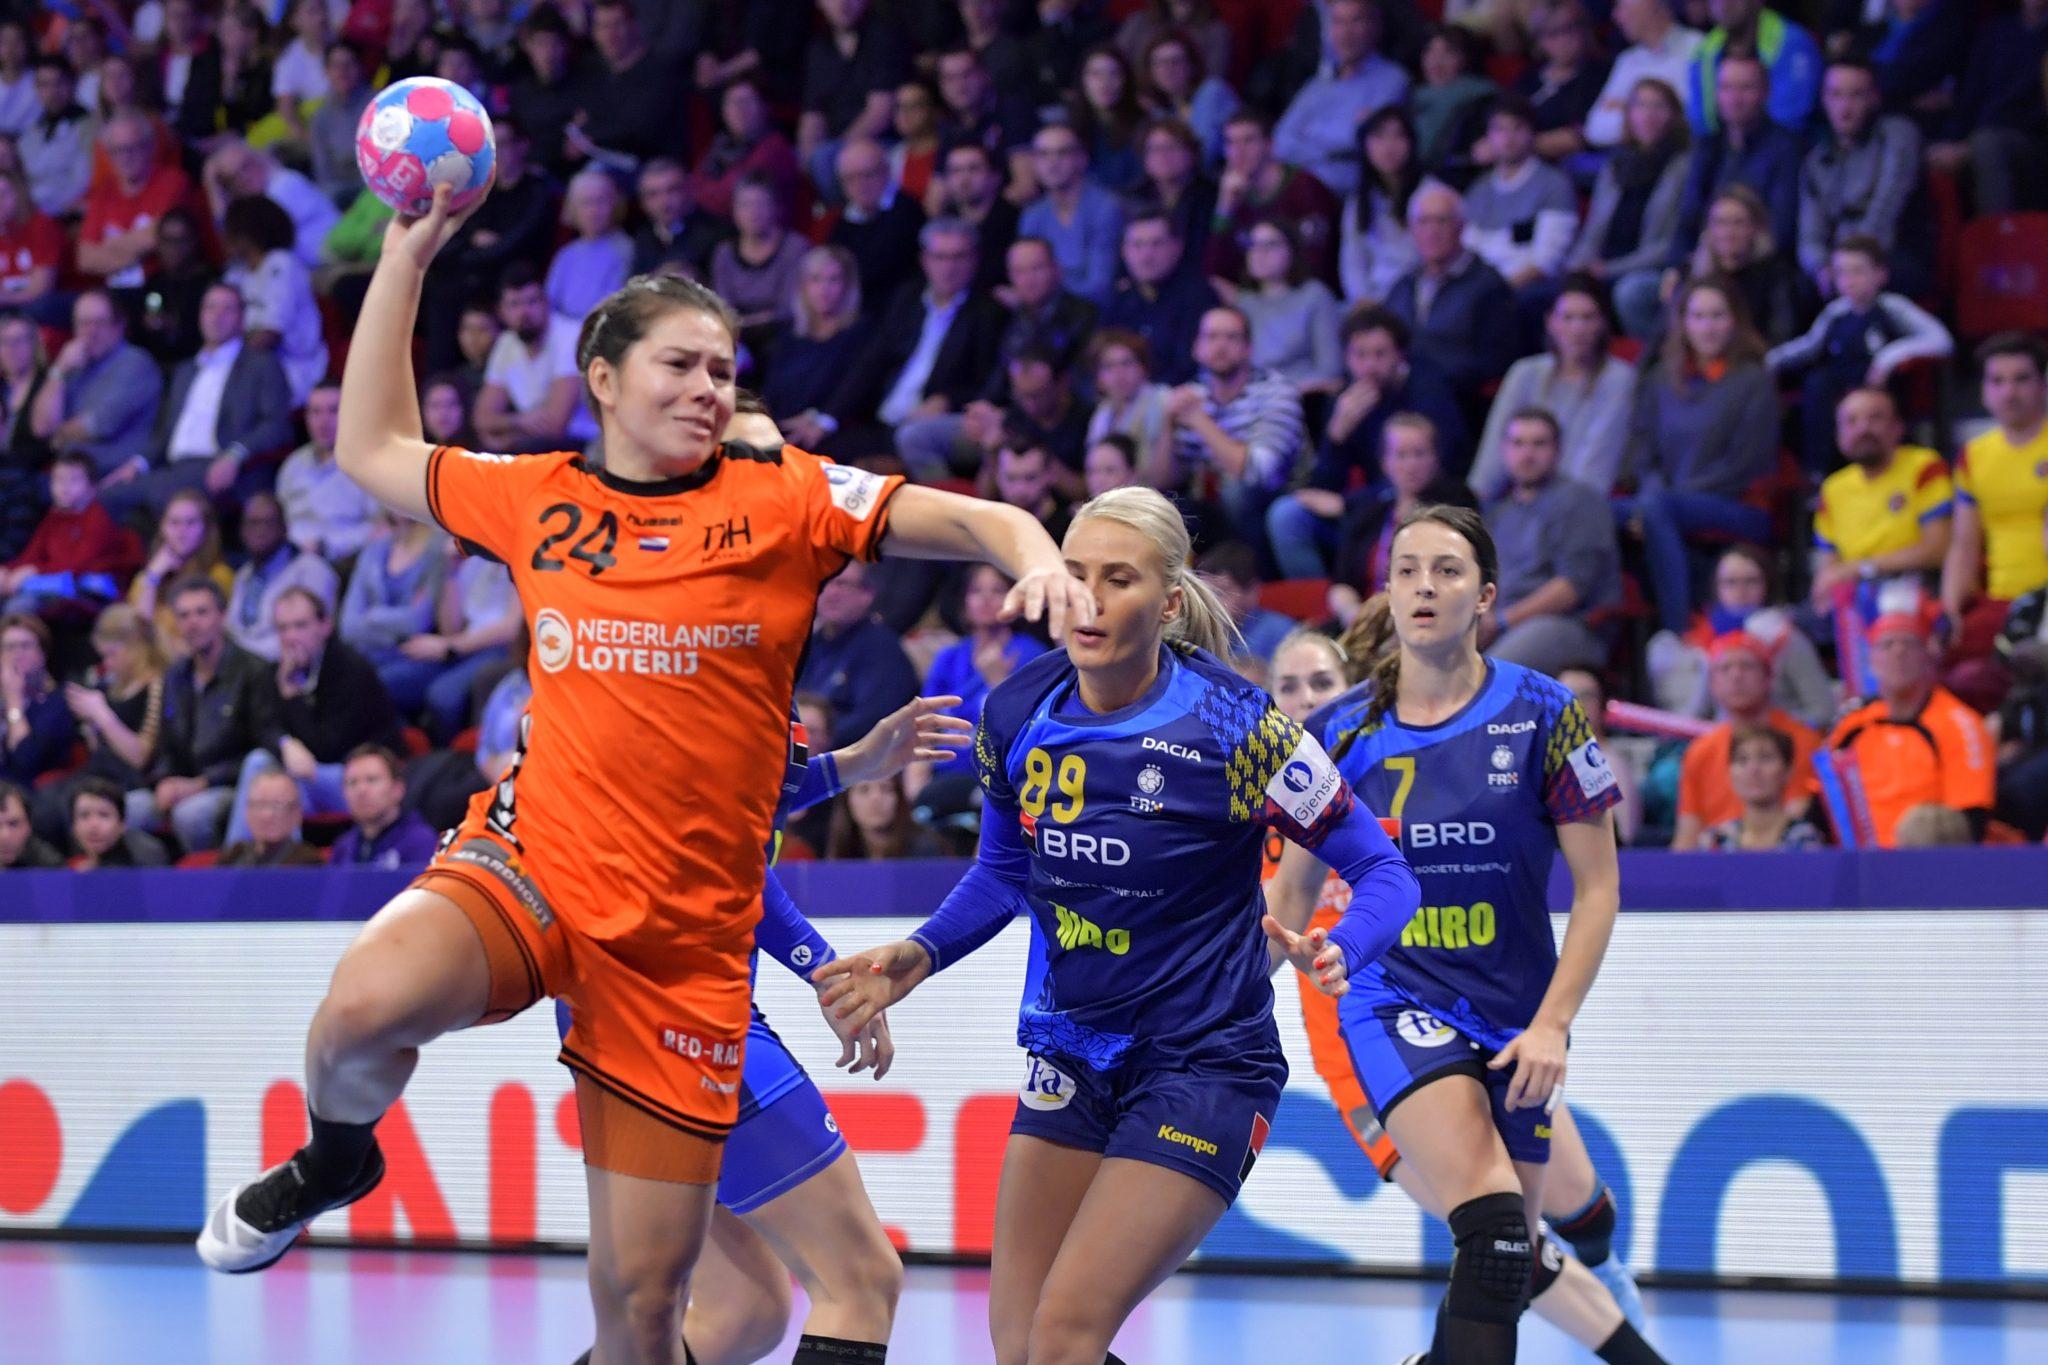 09-12-2018: Handbal: Vrouwen Nederland V Roemenie: Nancy EK Handbal In Frankrijk, Hoofdronde Groep II Nederland - Roemenie Martine Smeets #24 NED